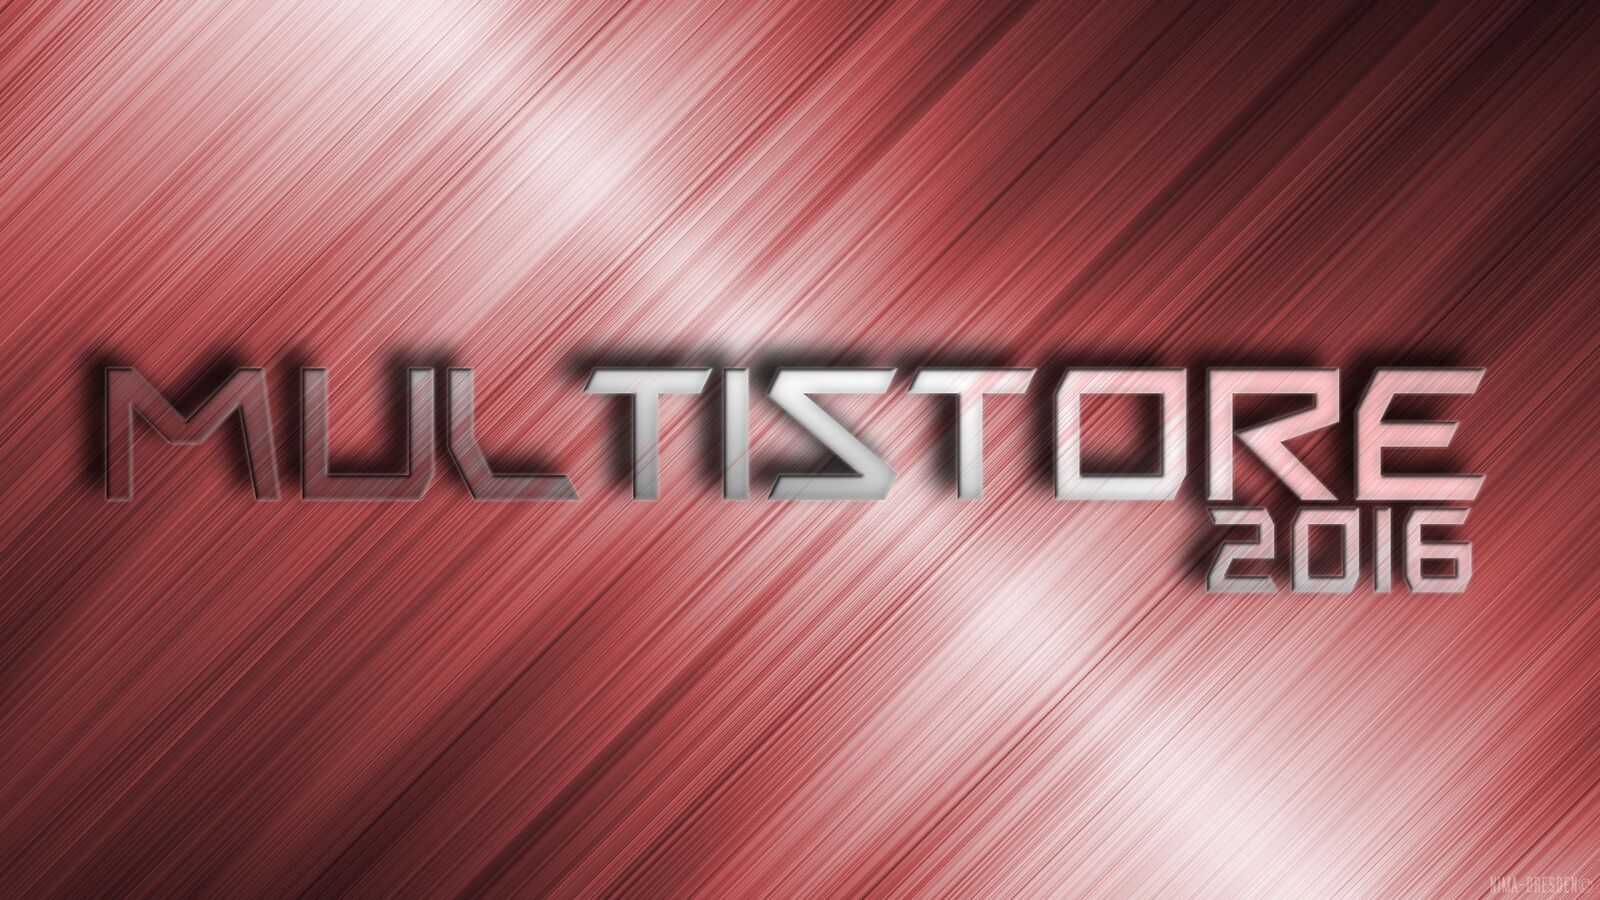 multistore2016